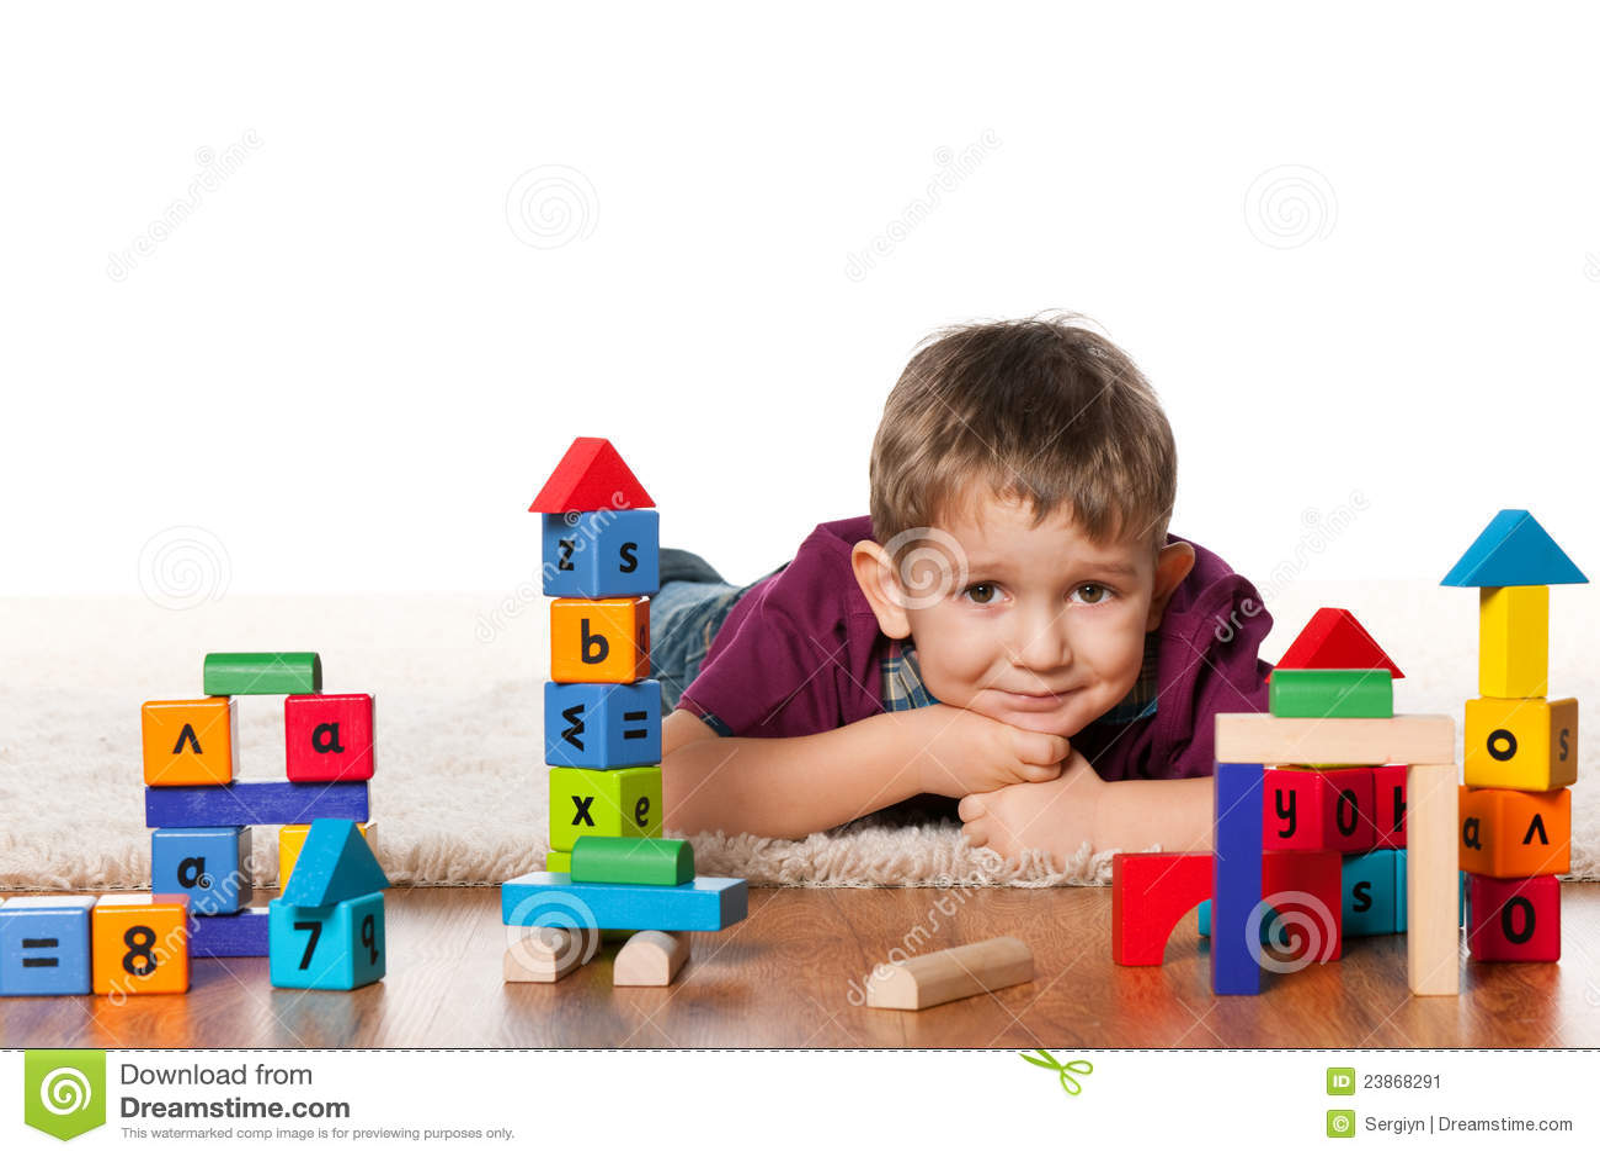 Little Boy Toys : Little boy on the floor near toys stock image